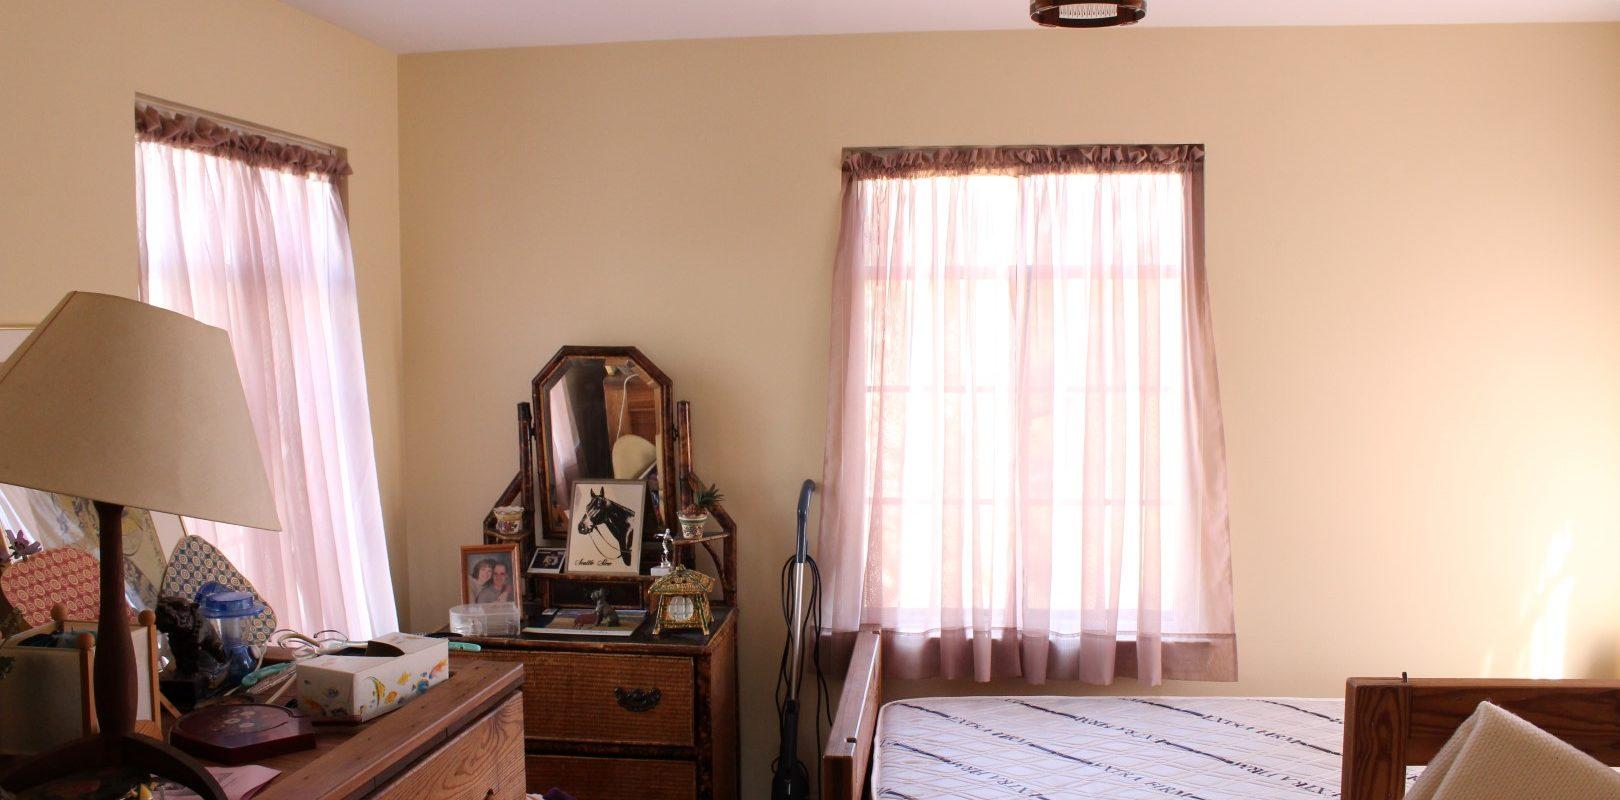 981-985 Coolidge Rd, Elizabeth, NJ 07208